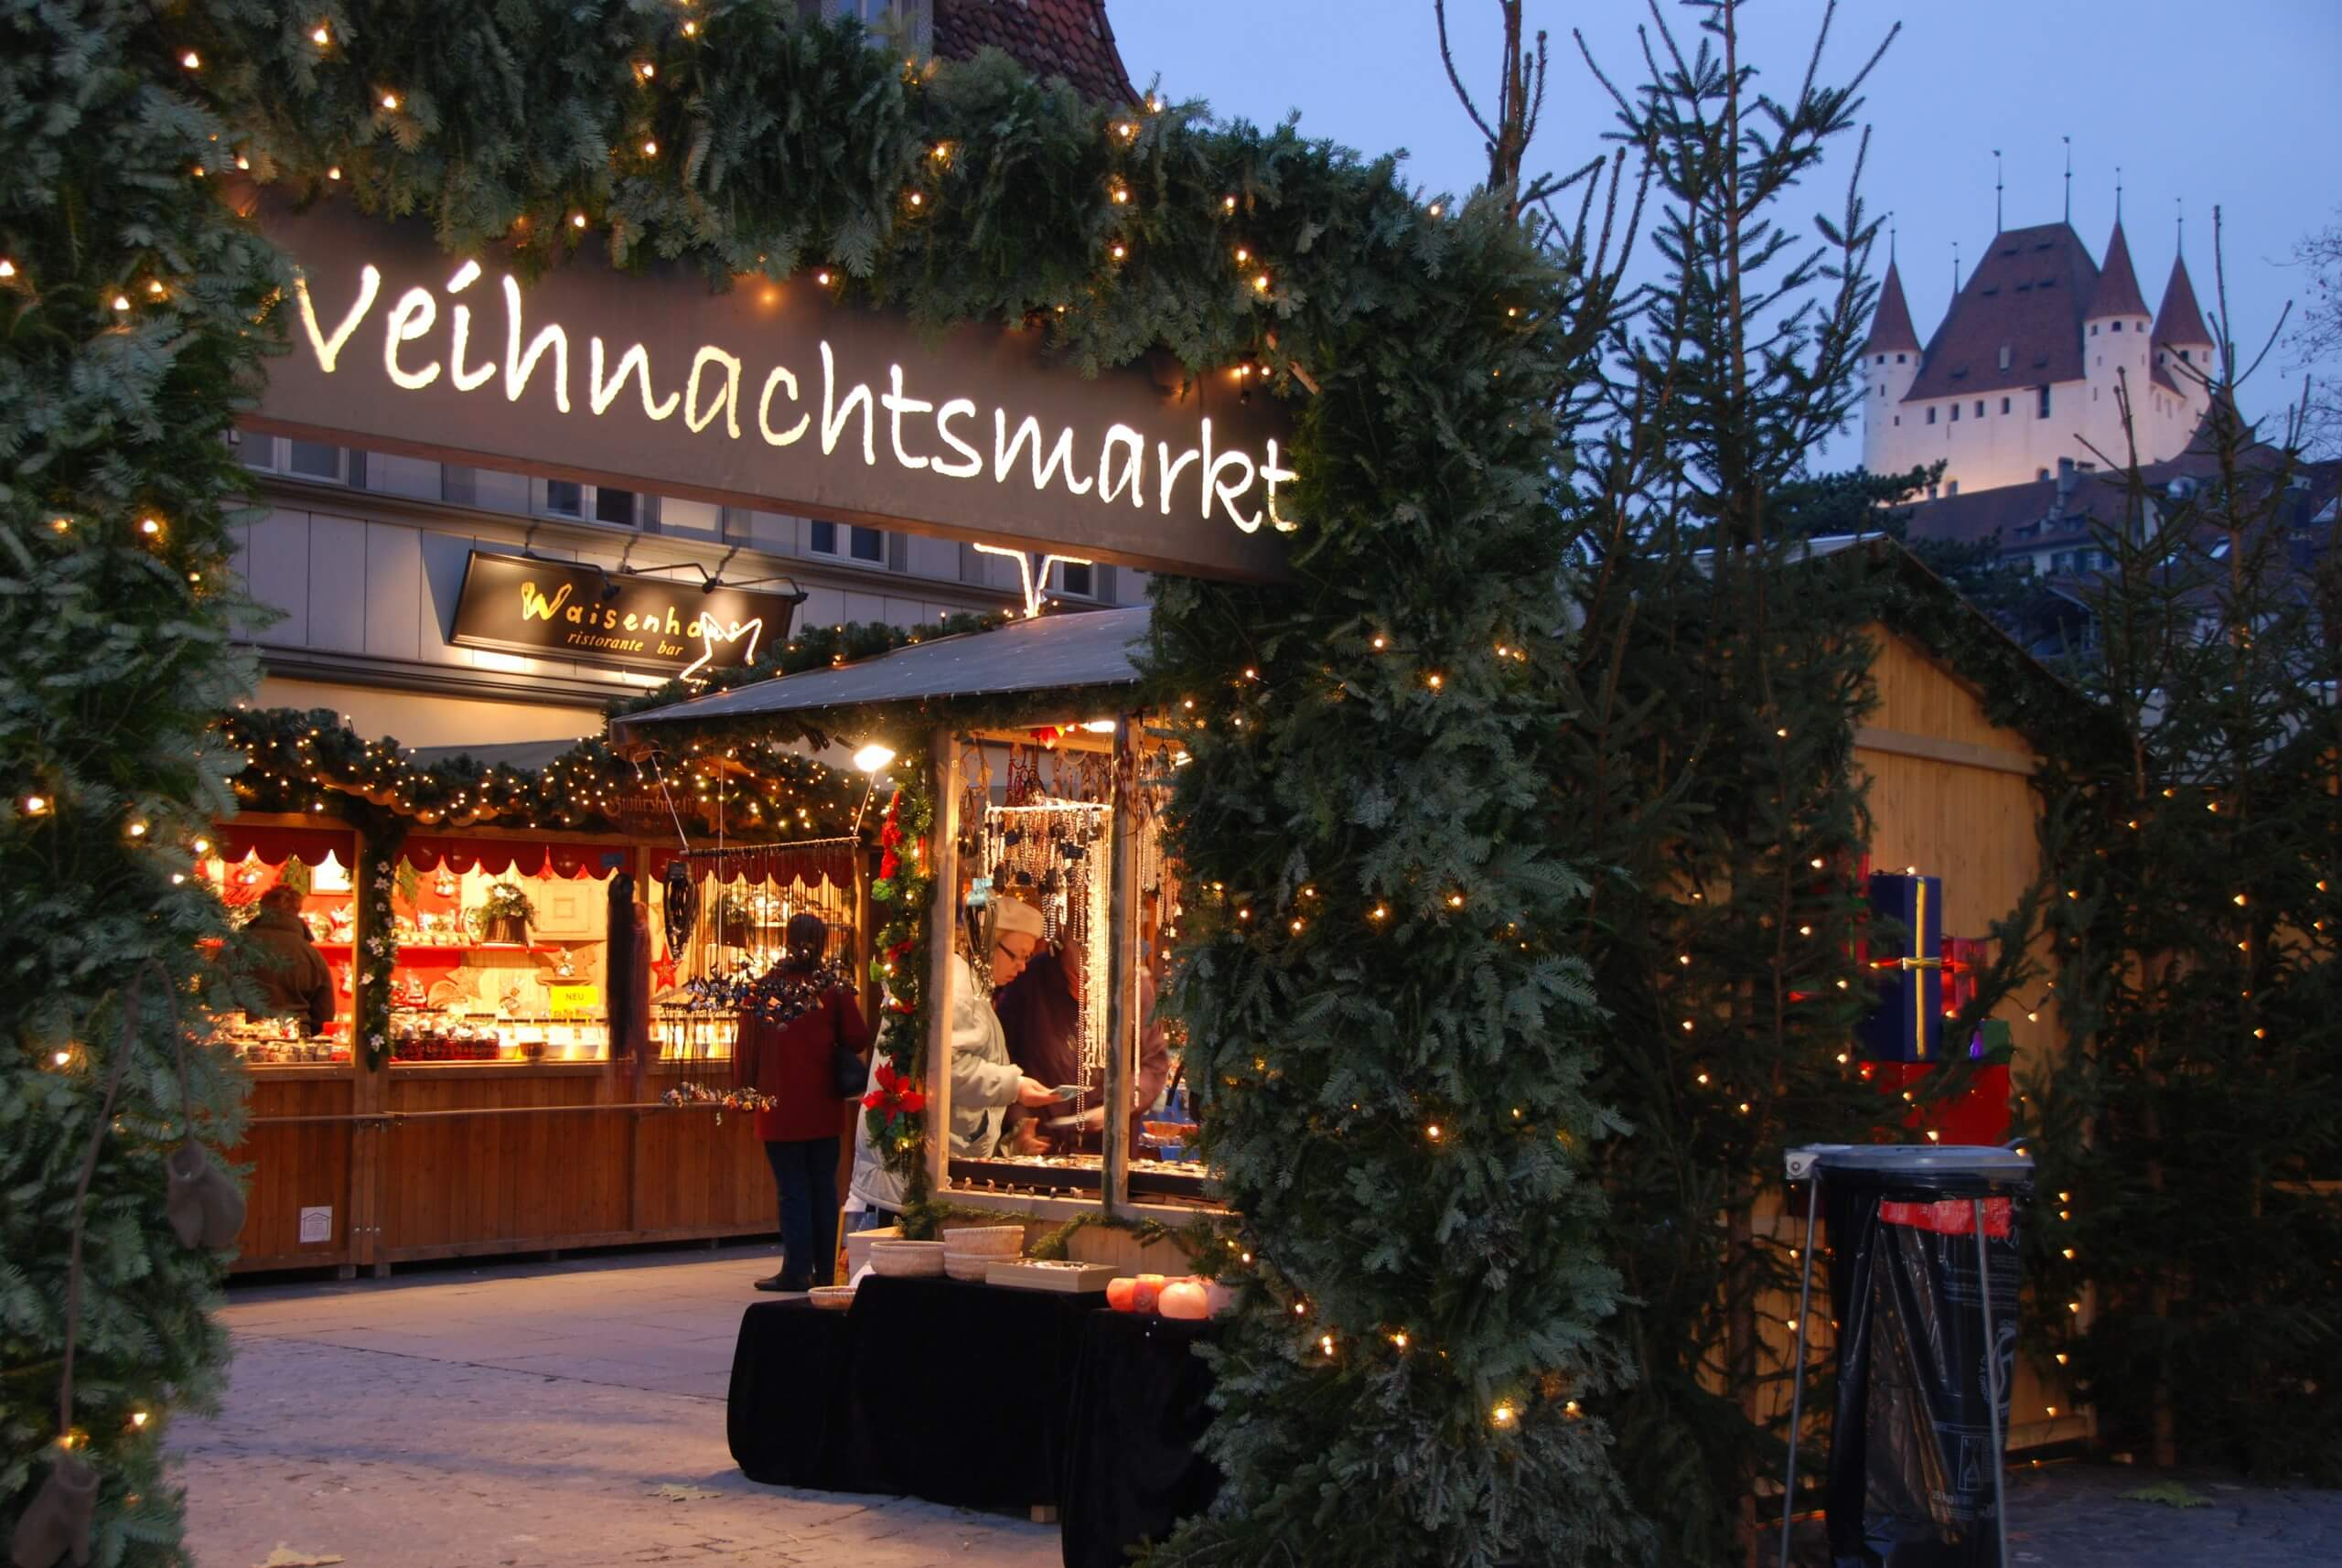 thun-waisenhausplatz-winter-weihnachtsmarkt-schloss